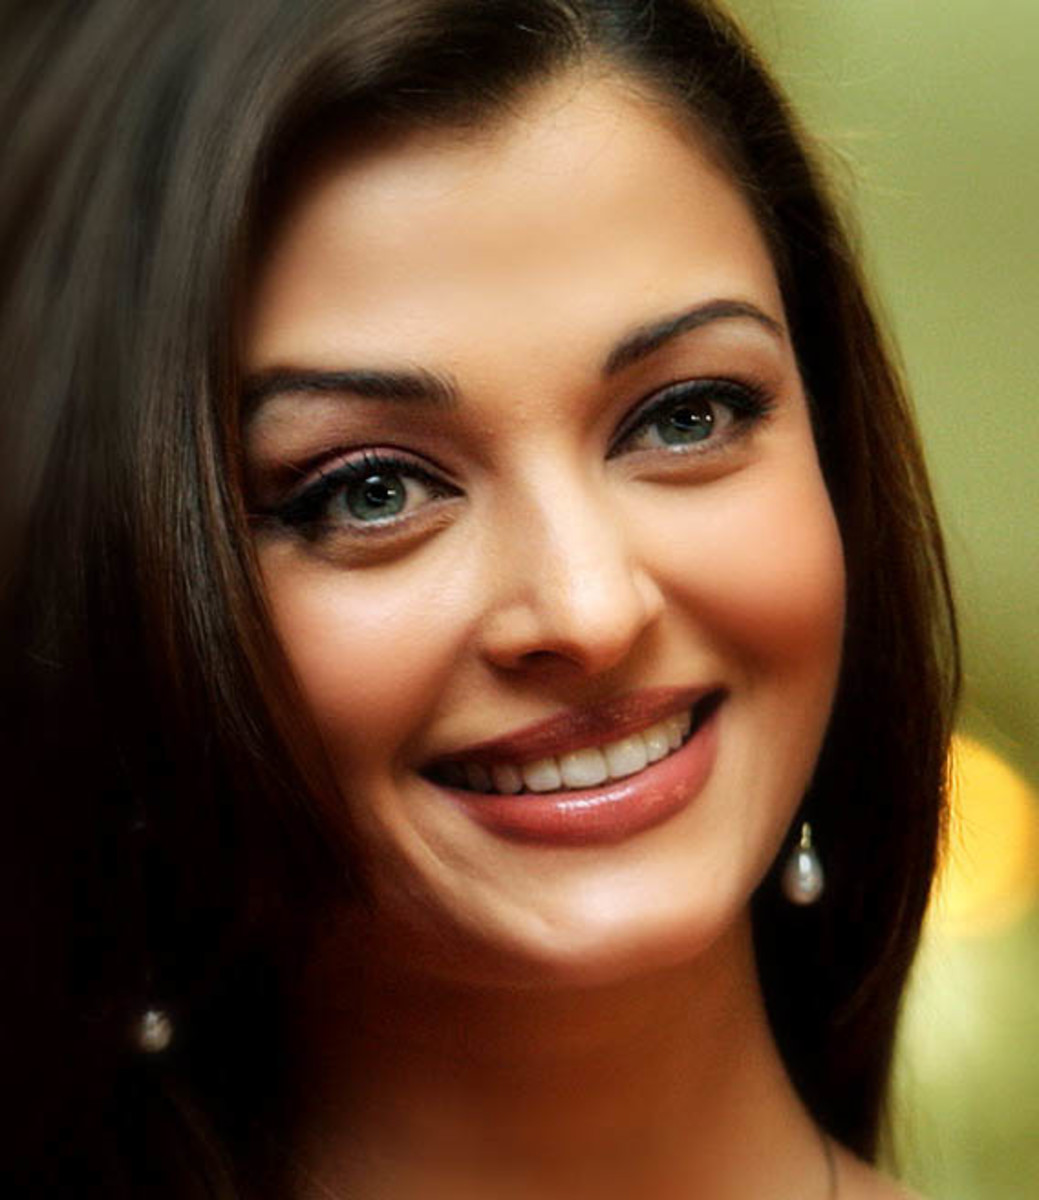 Most Beautiful smile of Aishwarya Rai